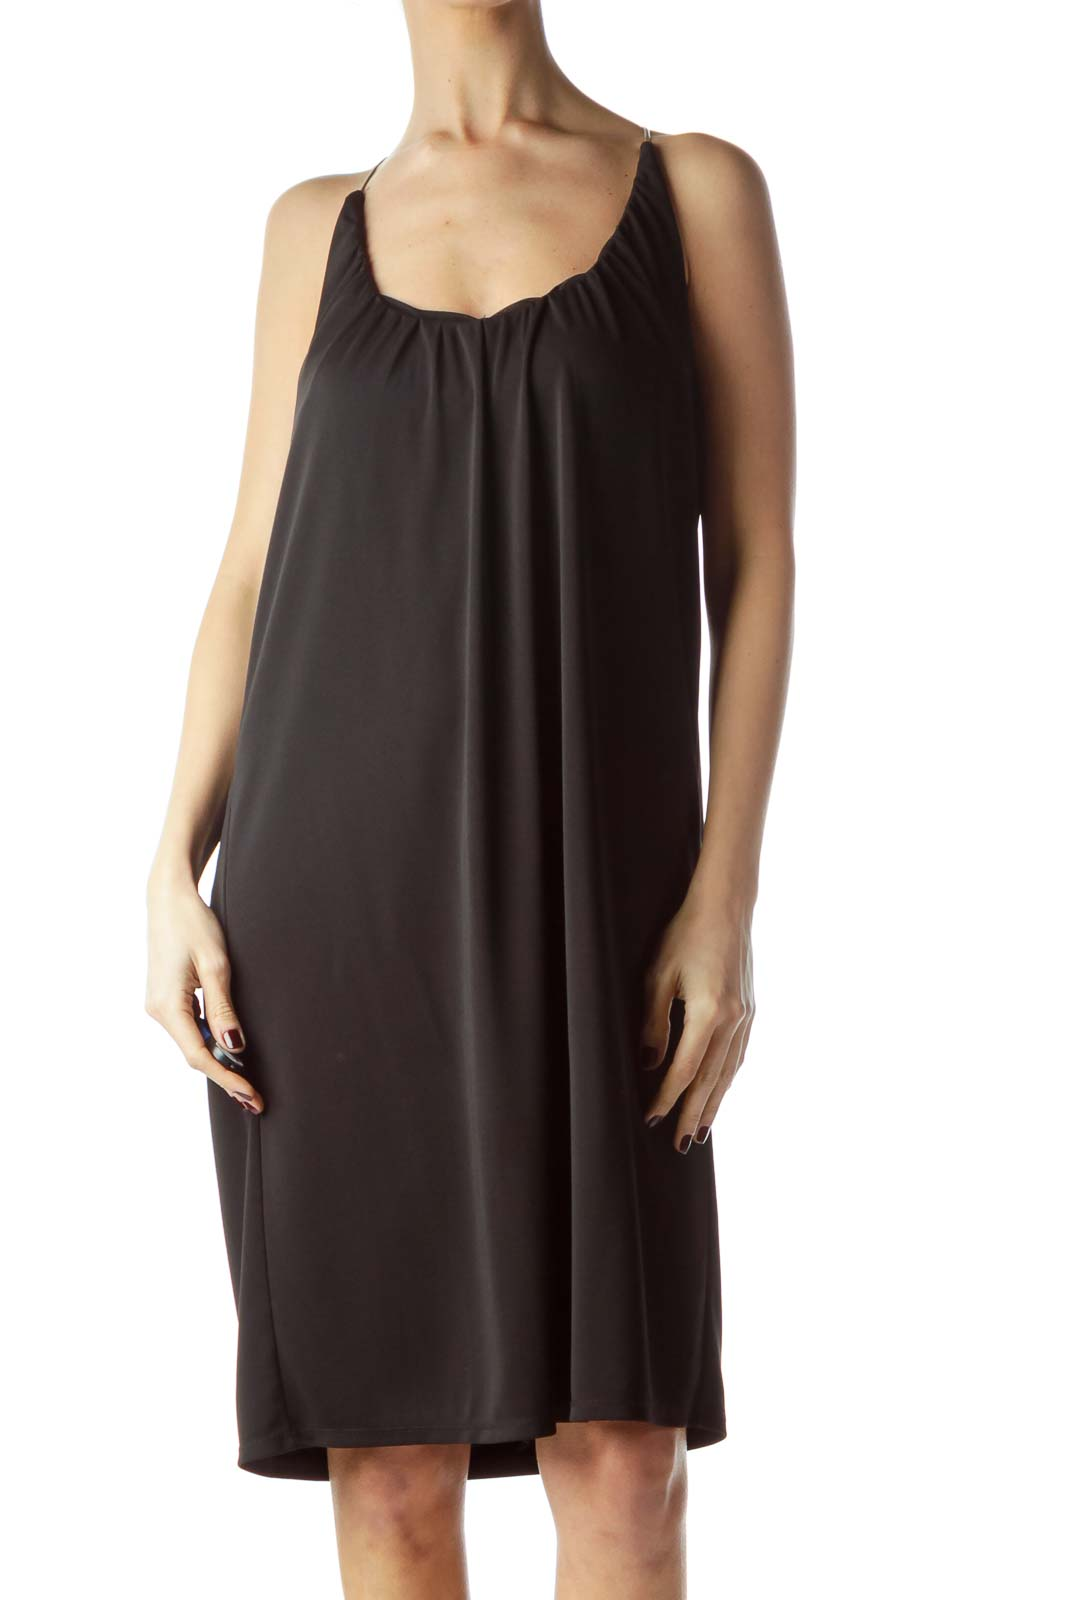 Black Shift Dress with Metallic Straps